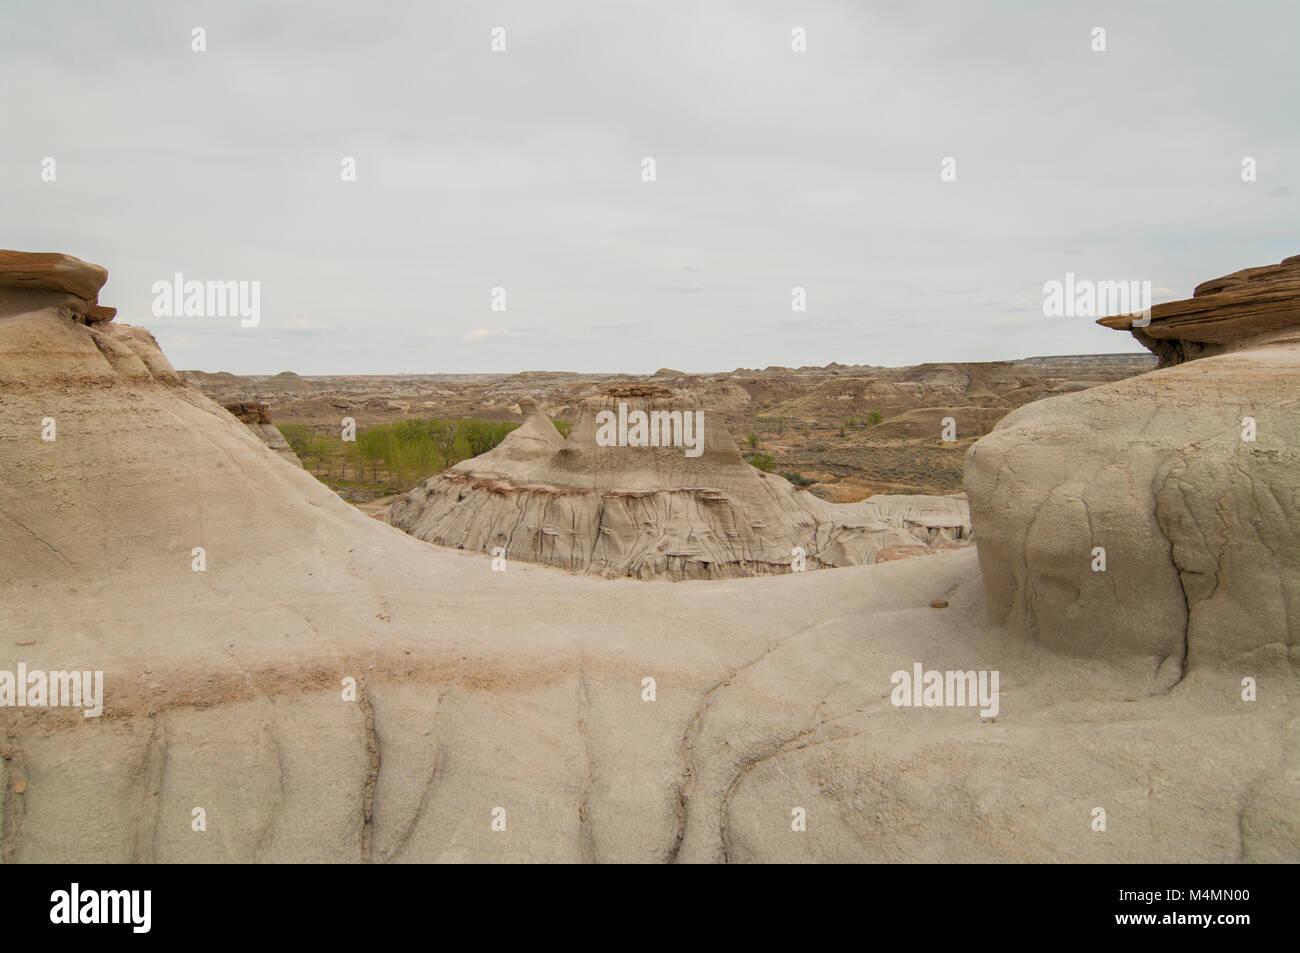 Landforms in Dinosaur Provincial Park, Alberta, Canada; a UNESCO World Heritage Site - Stock Image